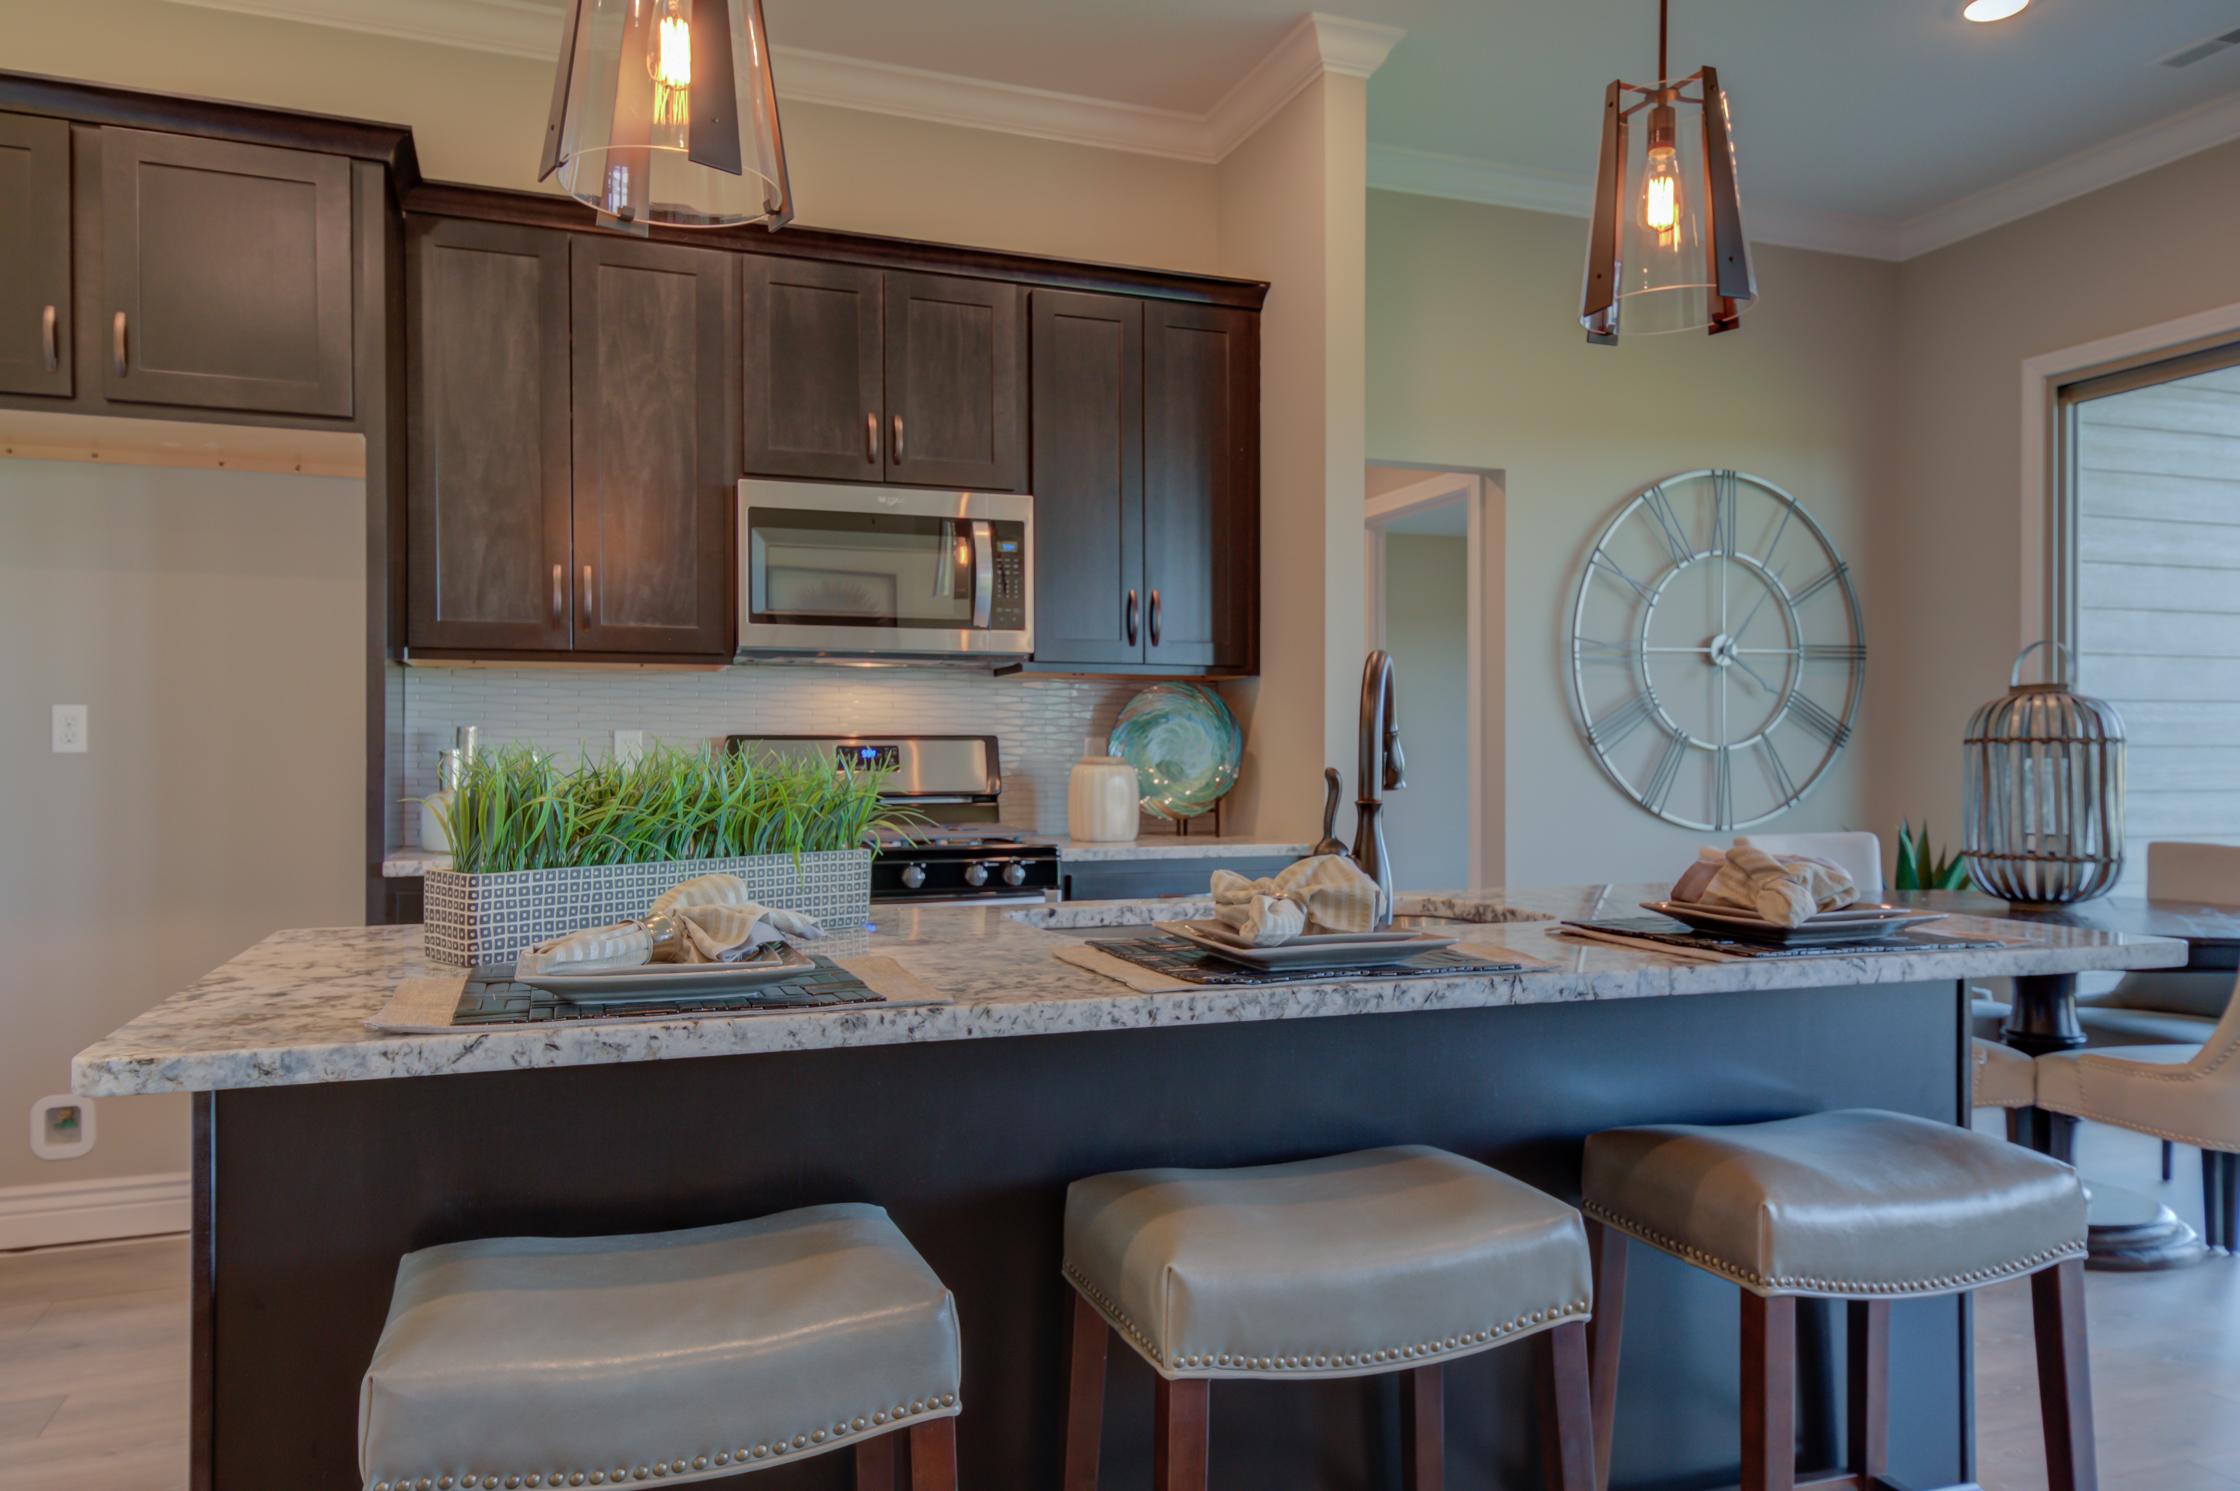 Kitchen_Island_New_Home.jpg